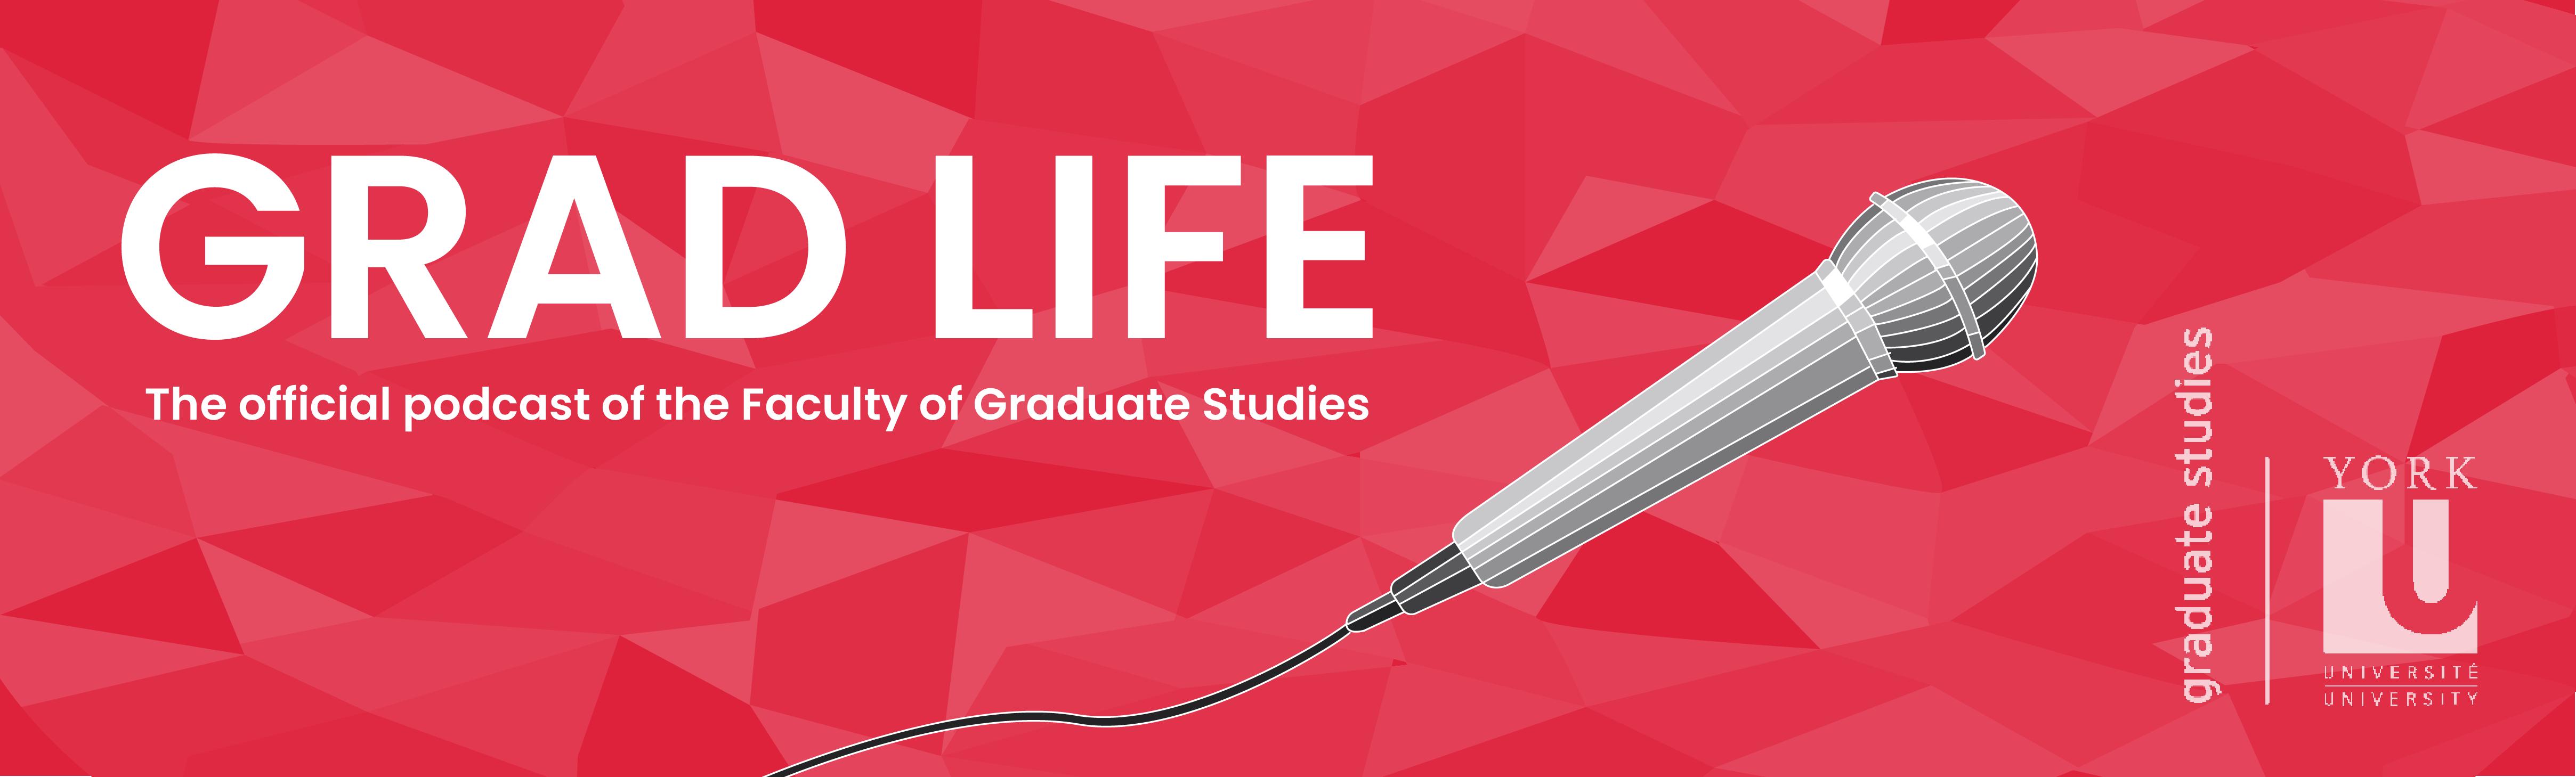 Grad Life Podcast